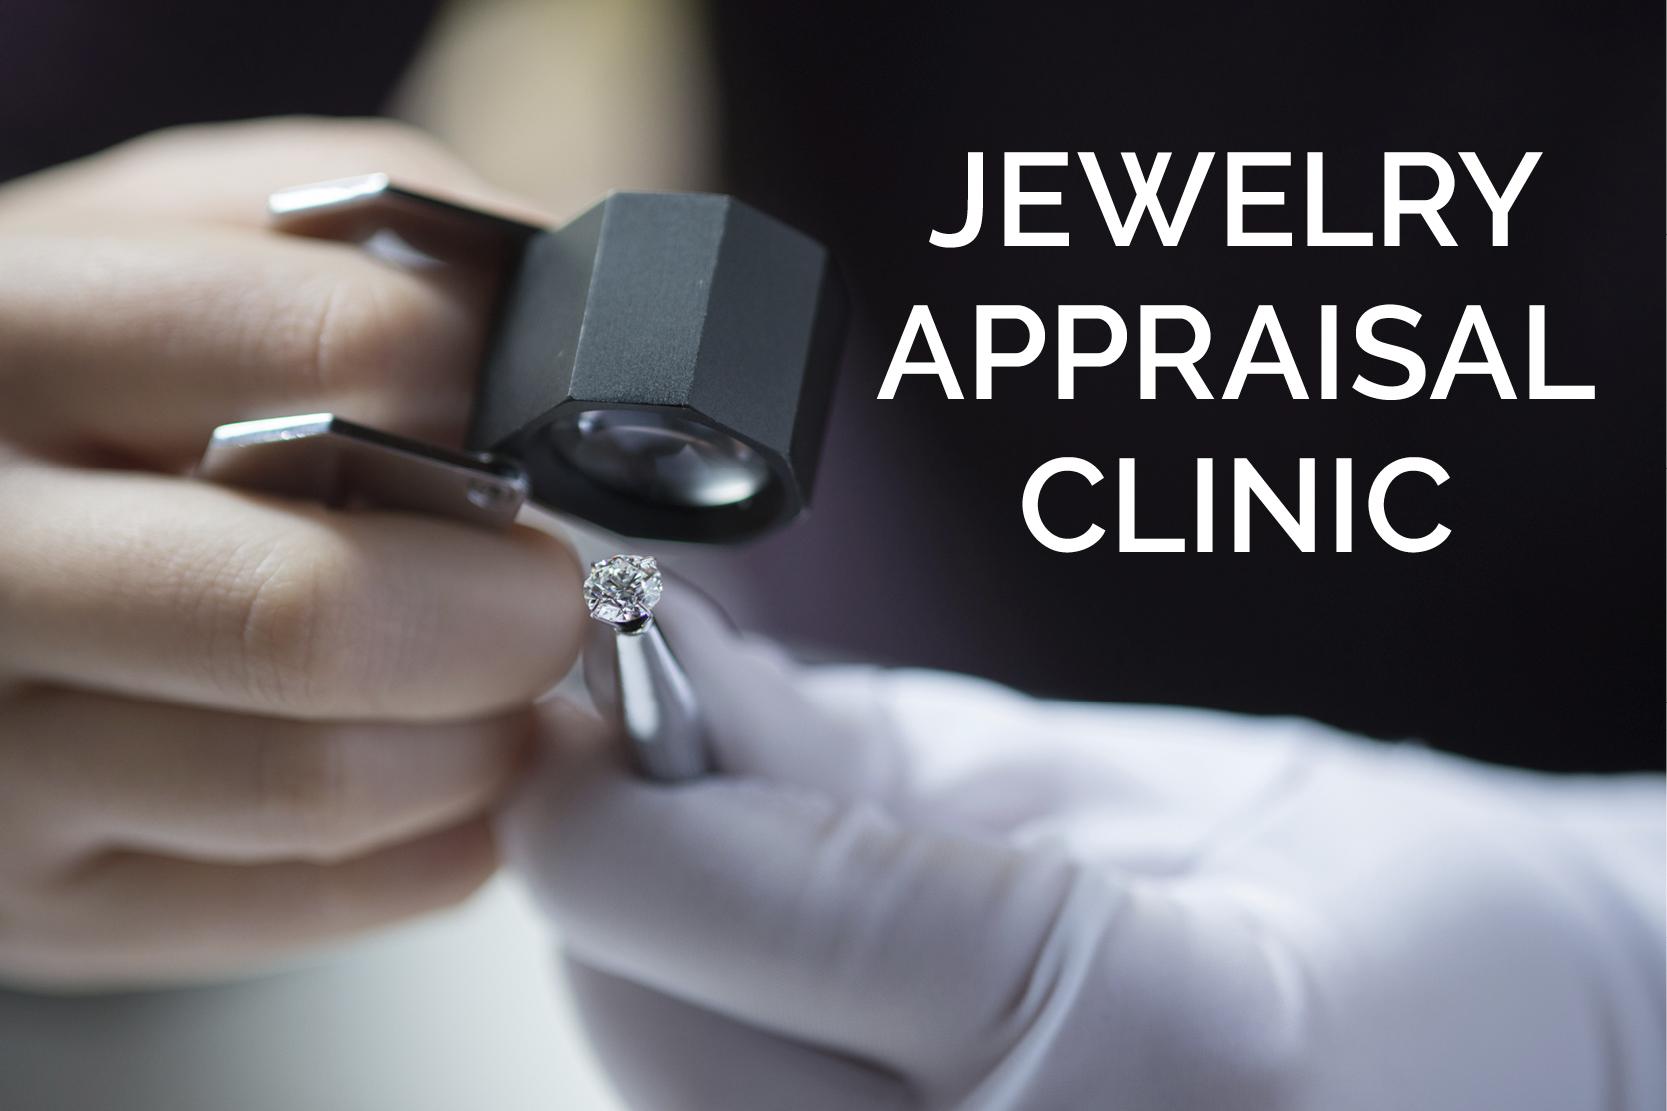 Jewelry Appraisal Clinic in Winston-Salem